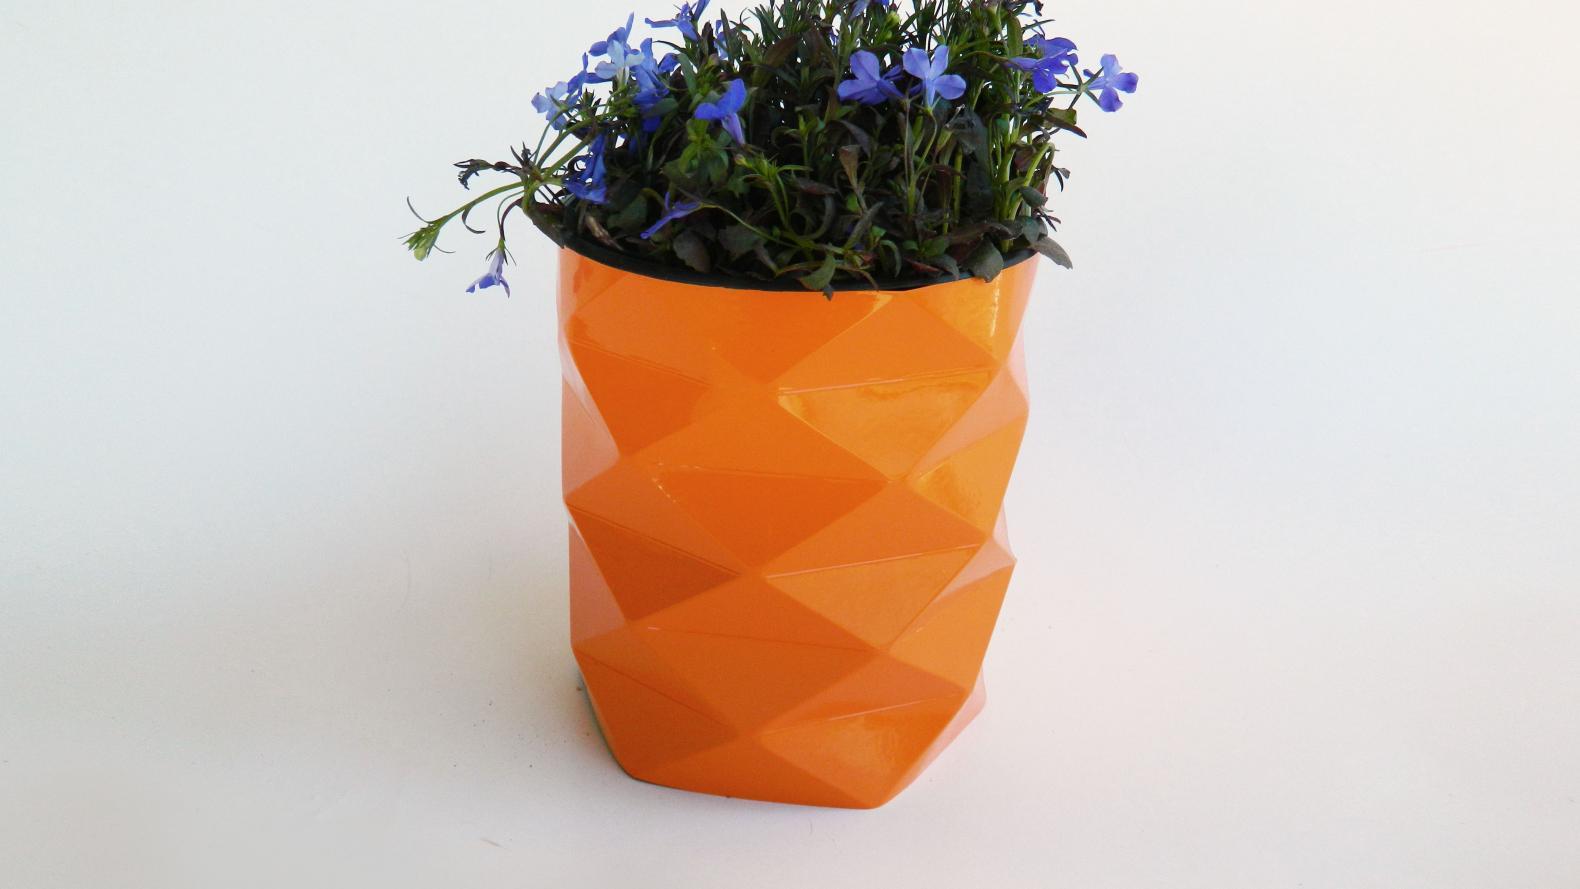 Modo primavera macetas para decorar interiores musa for Macetas para interiores hogar